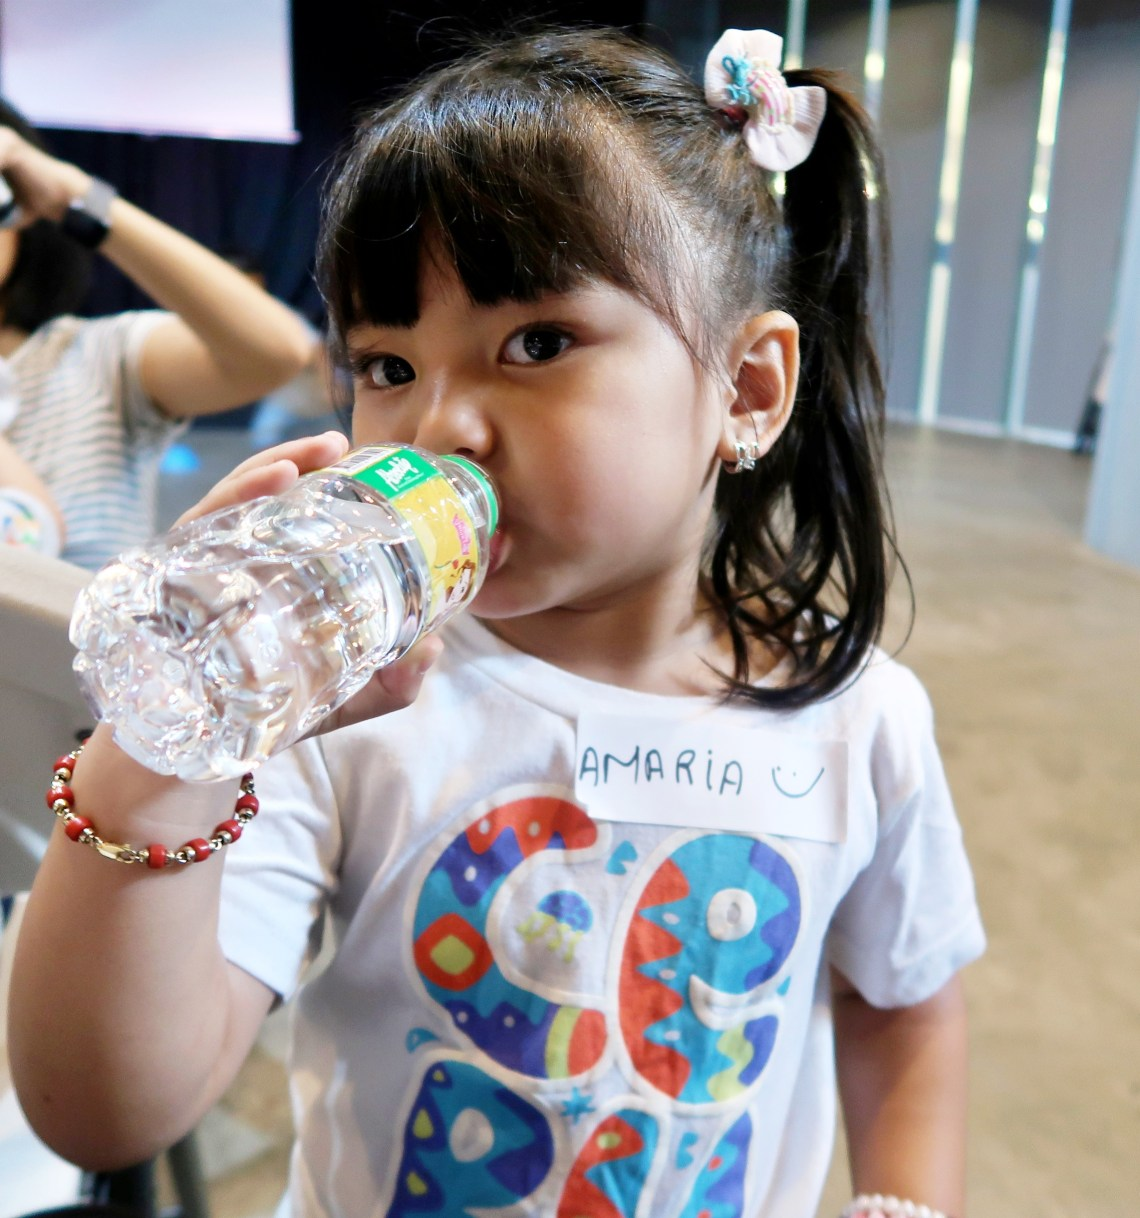 dyosathemomma: Ready Steady Go Kids, RSGK, multi-sports summer program activity for kids, Amaria Niszha, Absolute Distilled